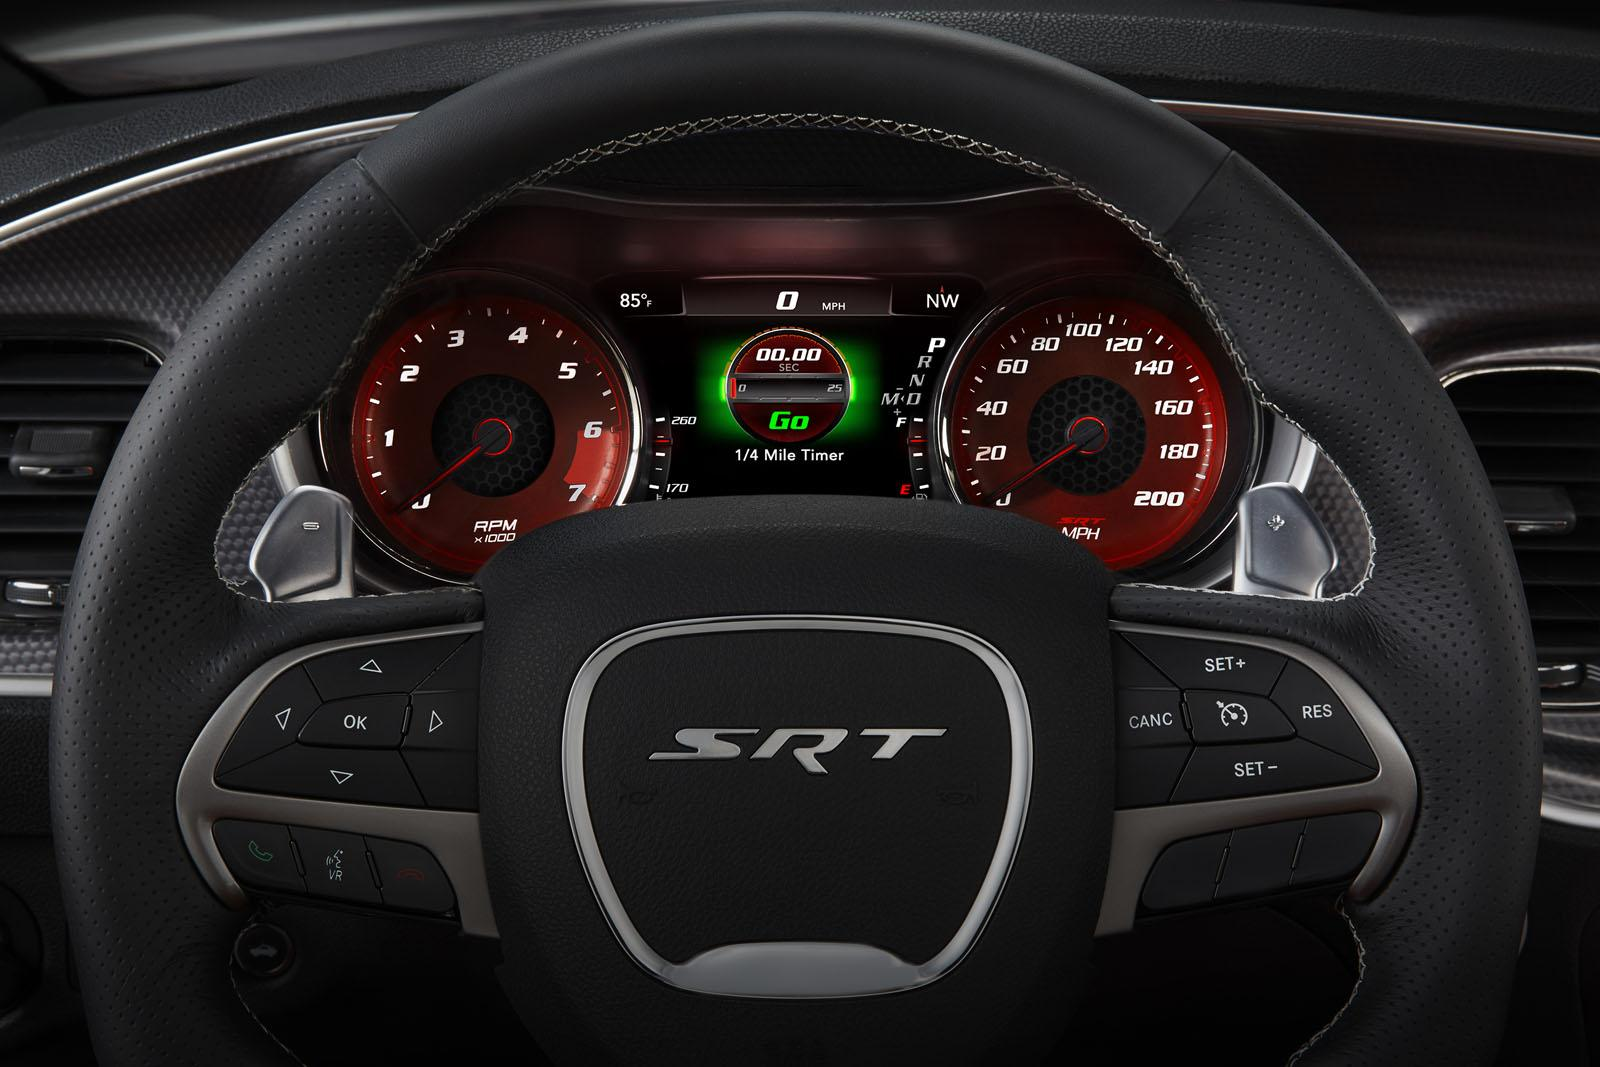 Dodge Cars News Fastest 4 Door Sedan The Charger Srt